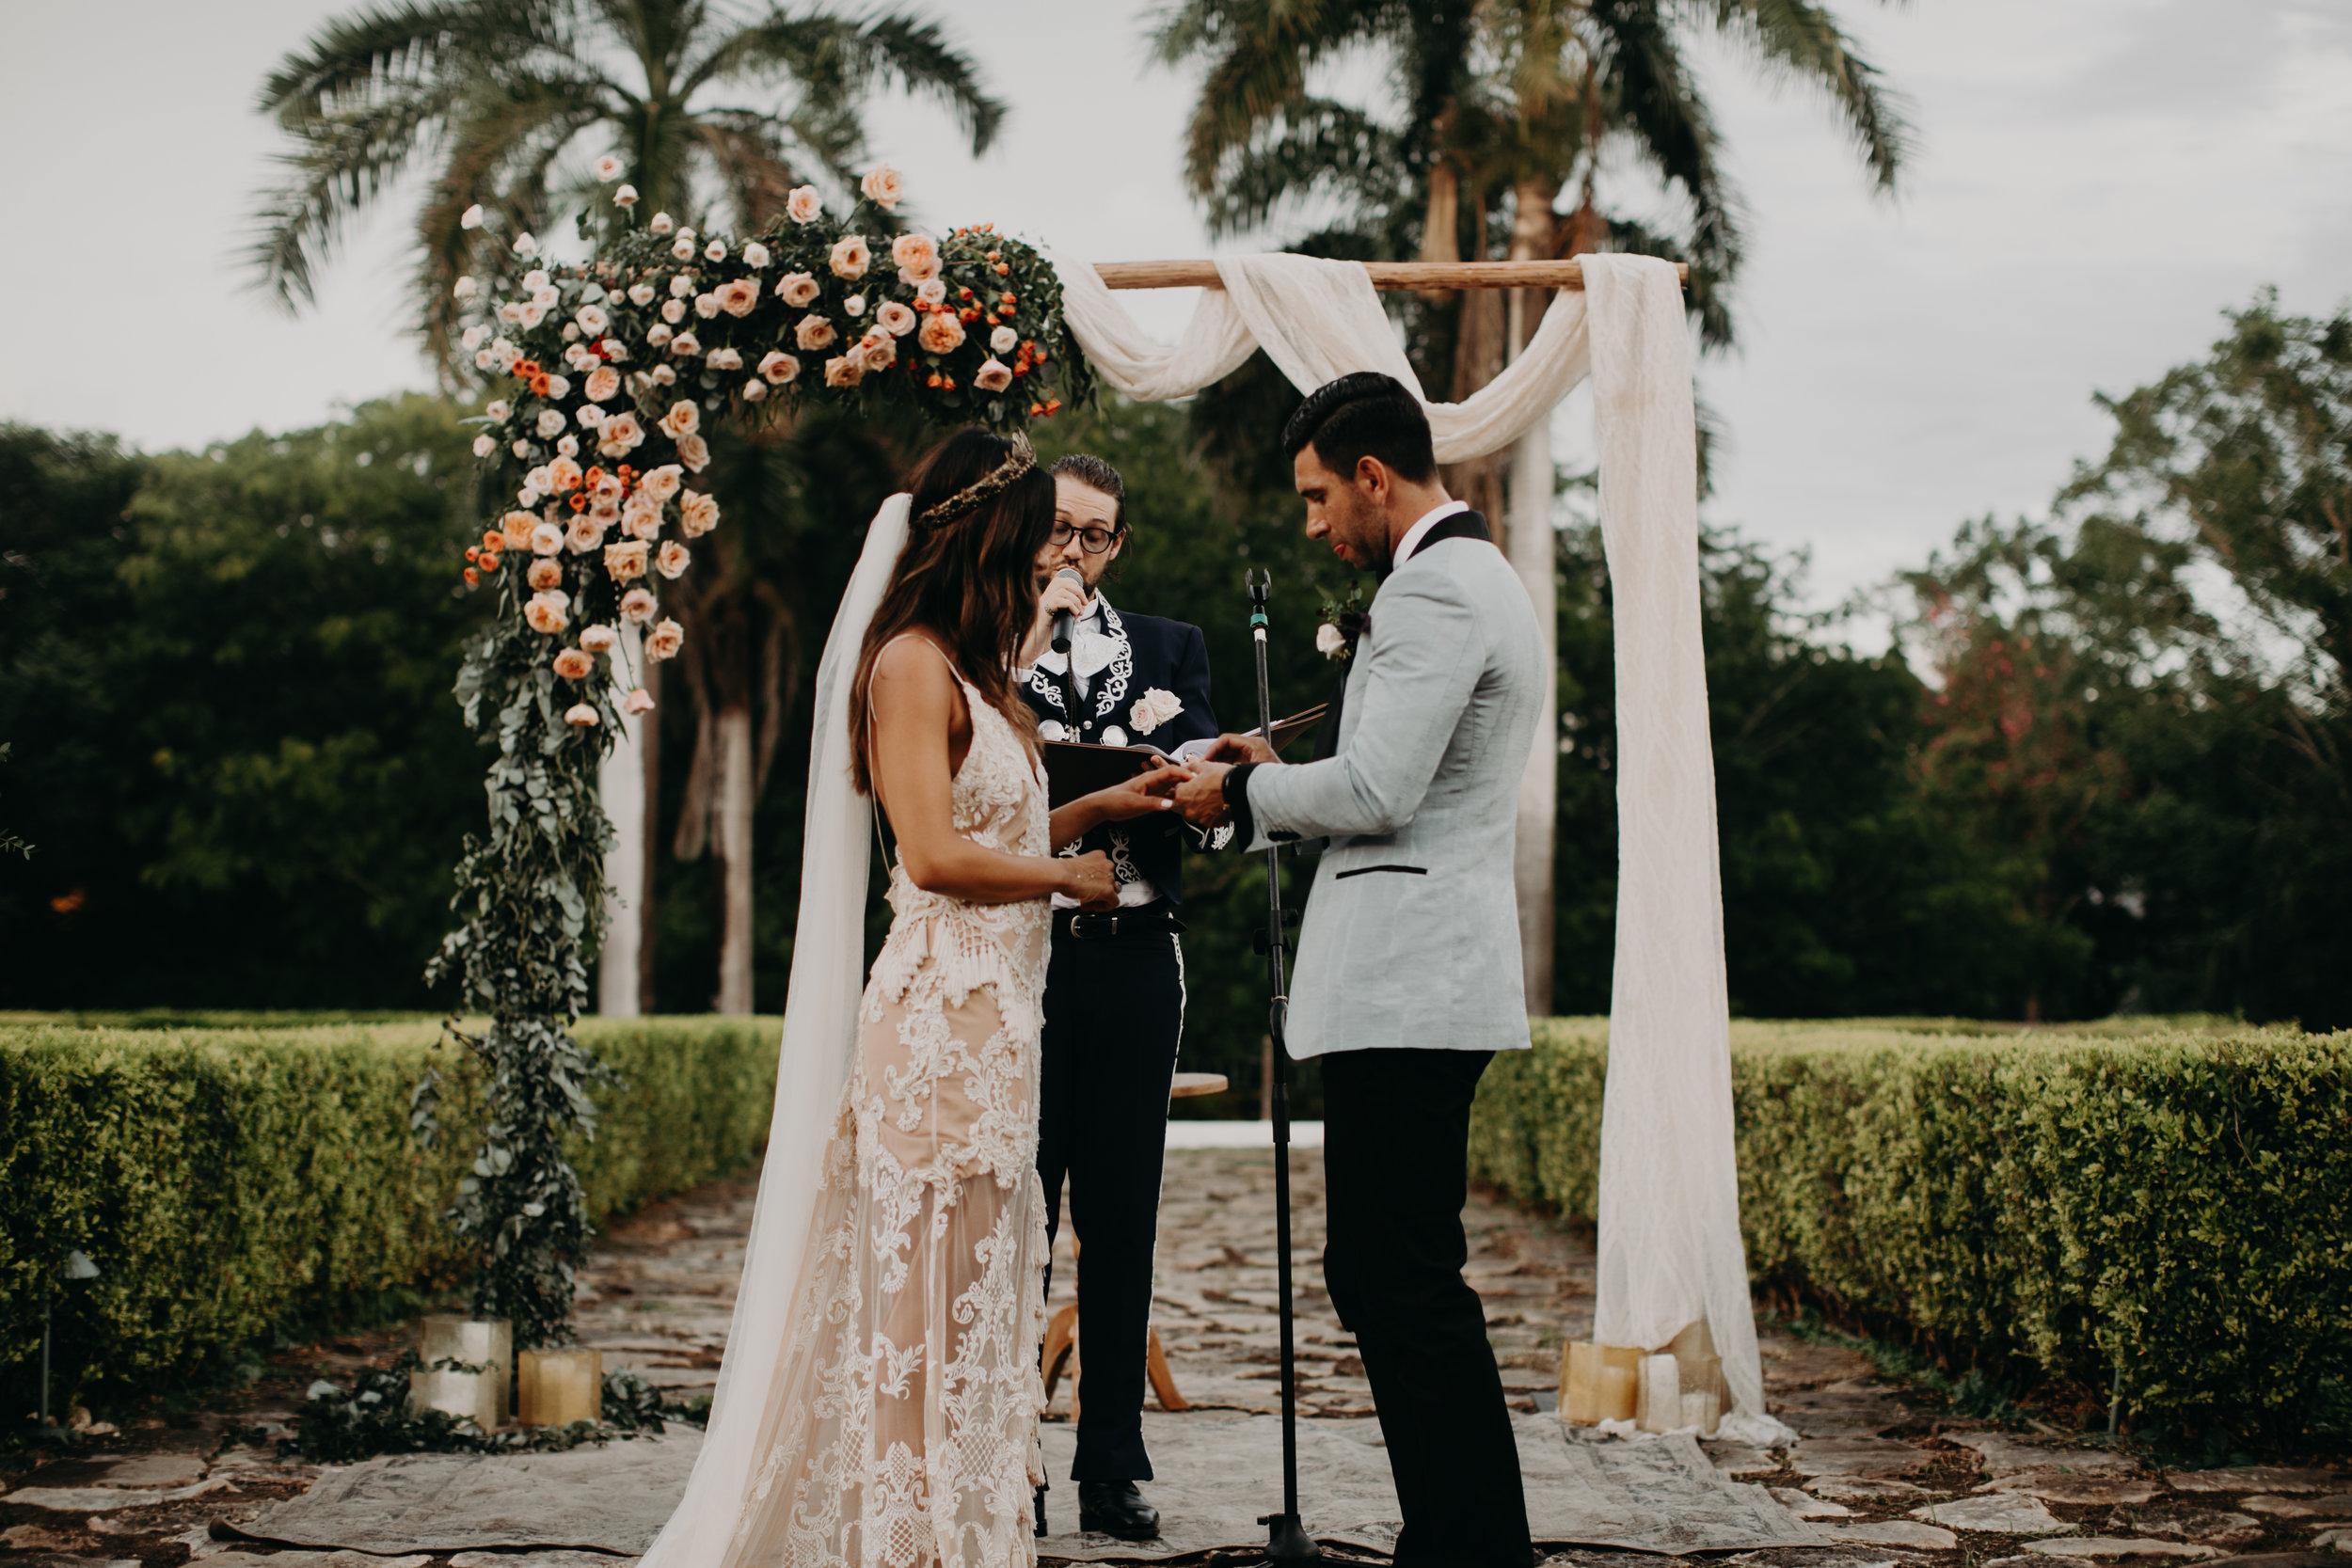 Hacienda Temozon Yucatan Mexico Wedding | Ida & Peter Emily Magers Photography-1088.jpg